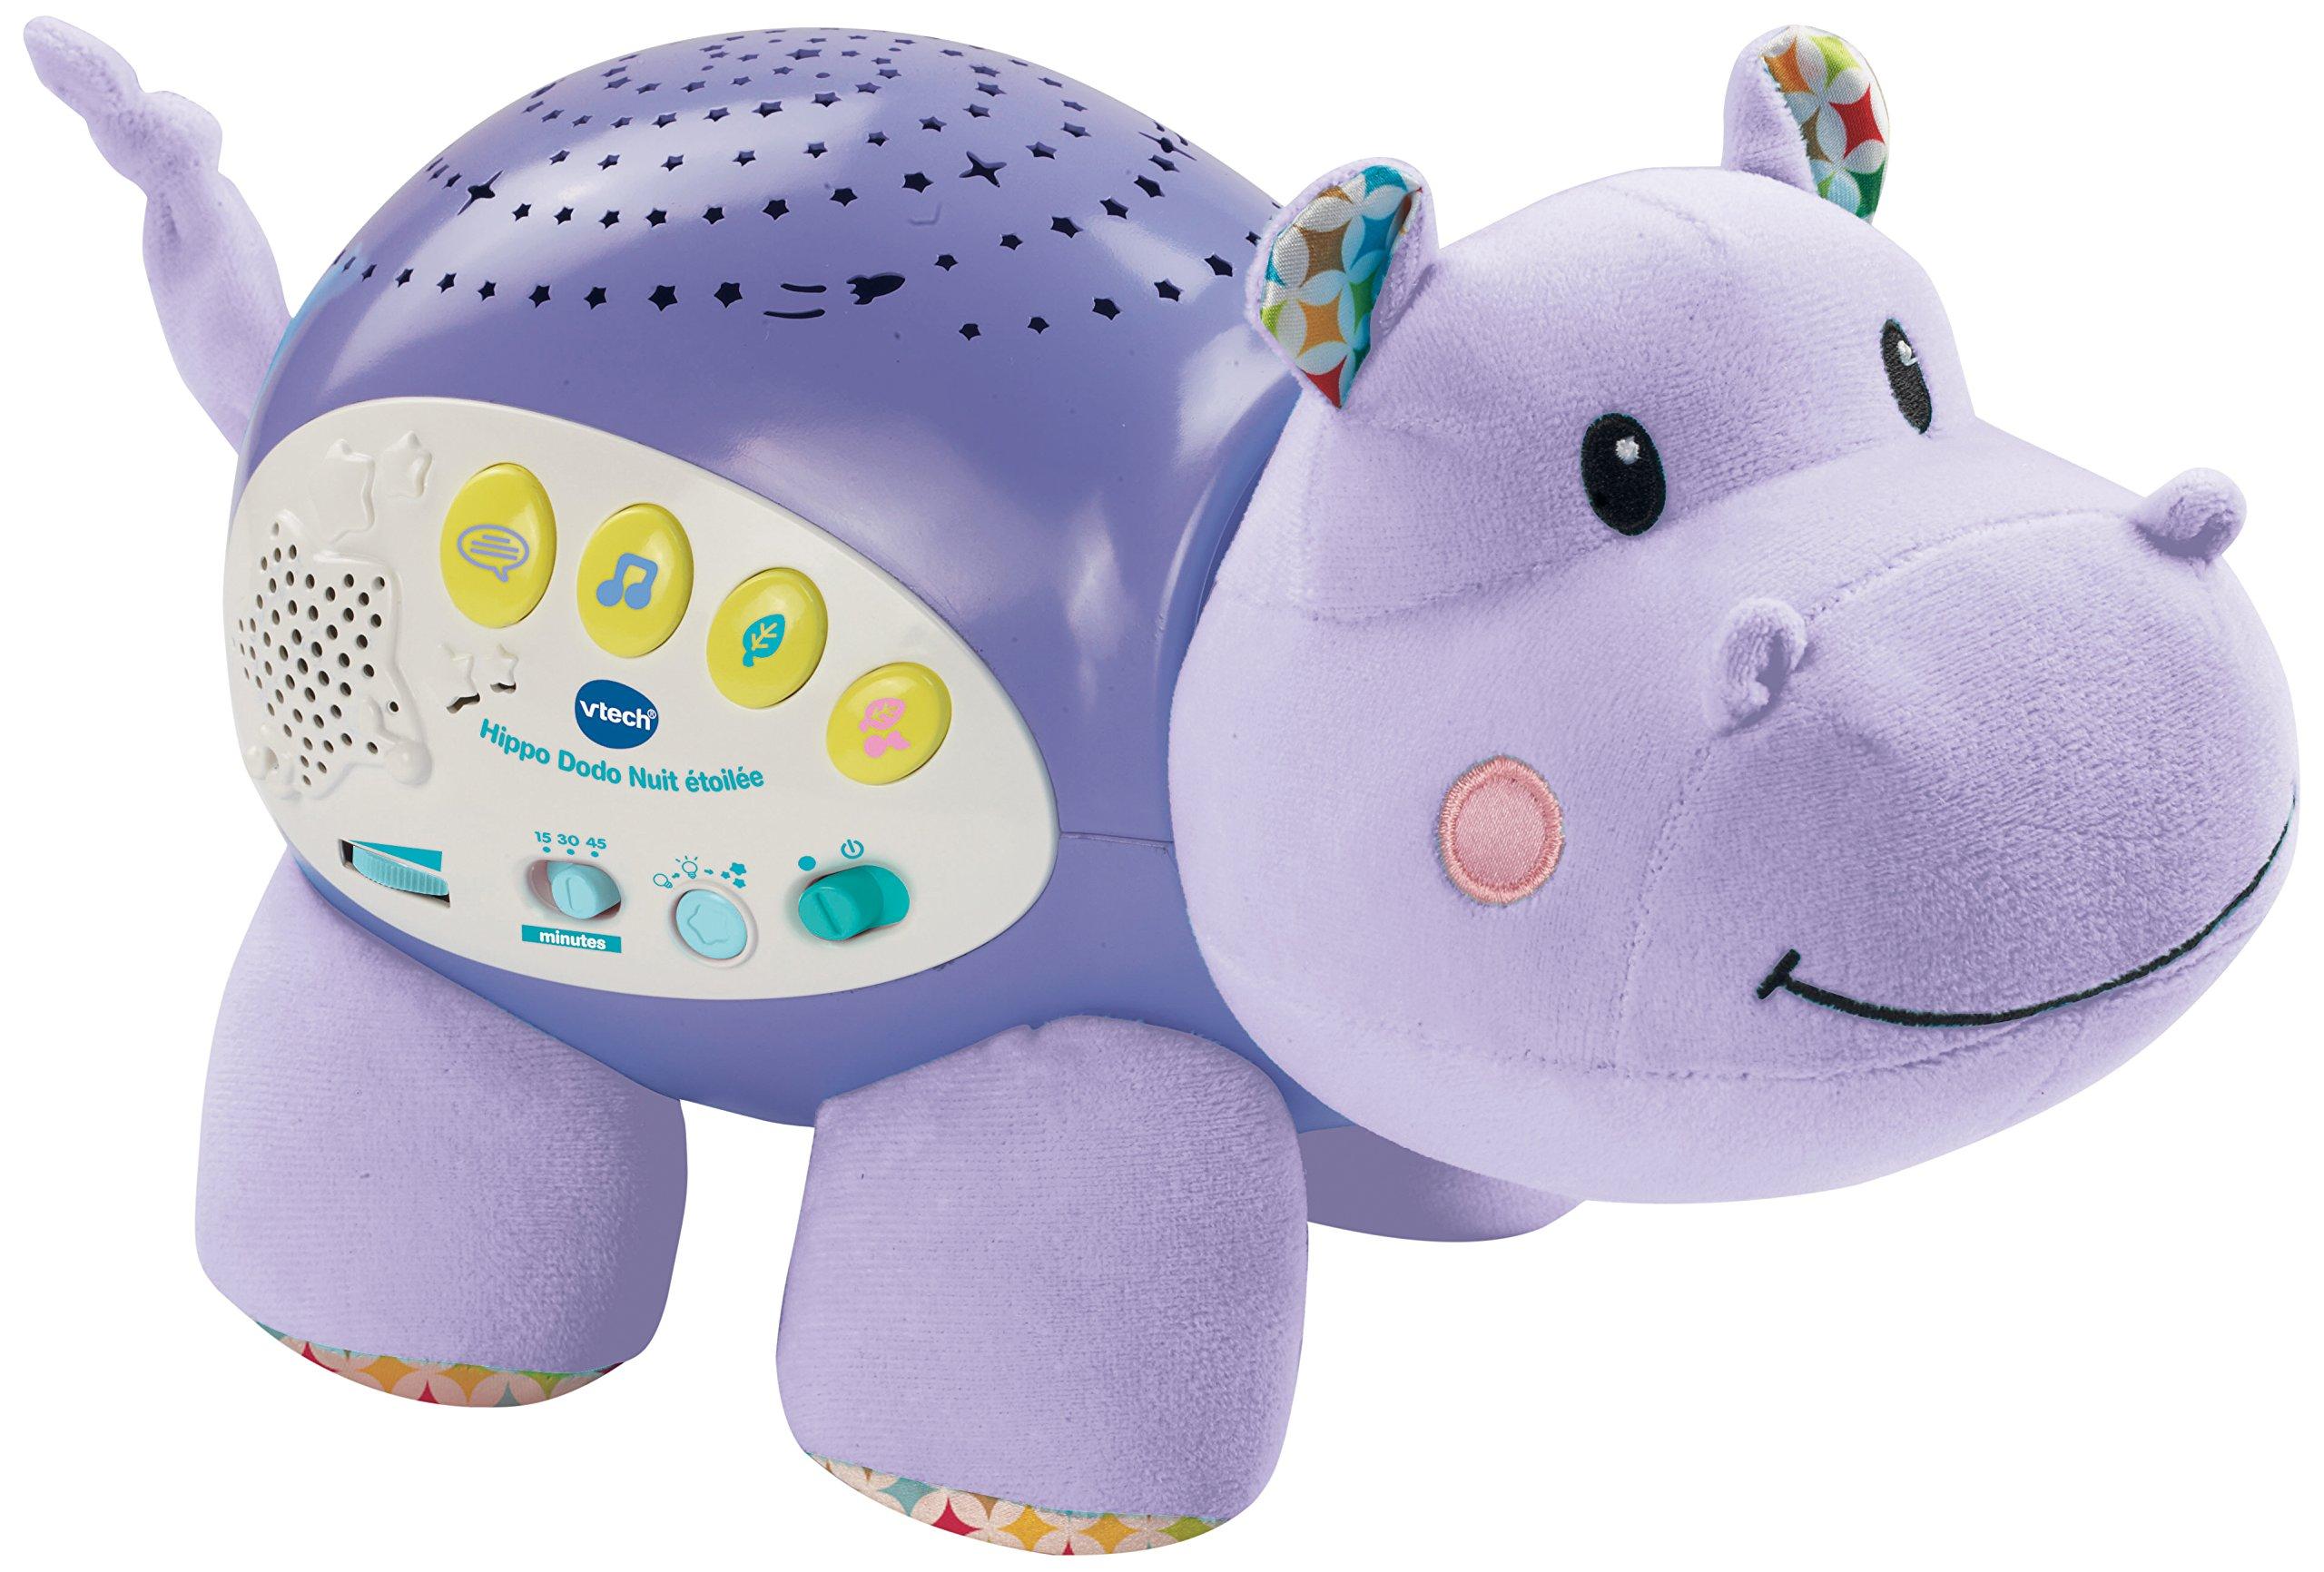 Vtech - 180905 -Veilleuse - Hippo Dodo Nuit Etoilée product image